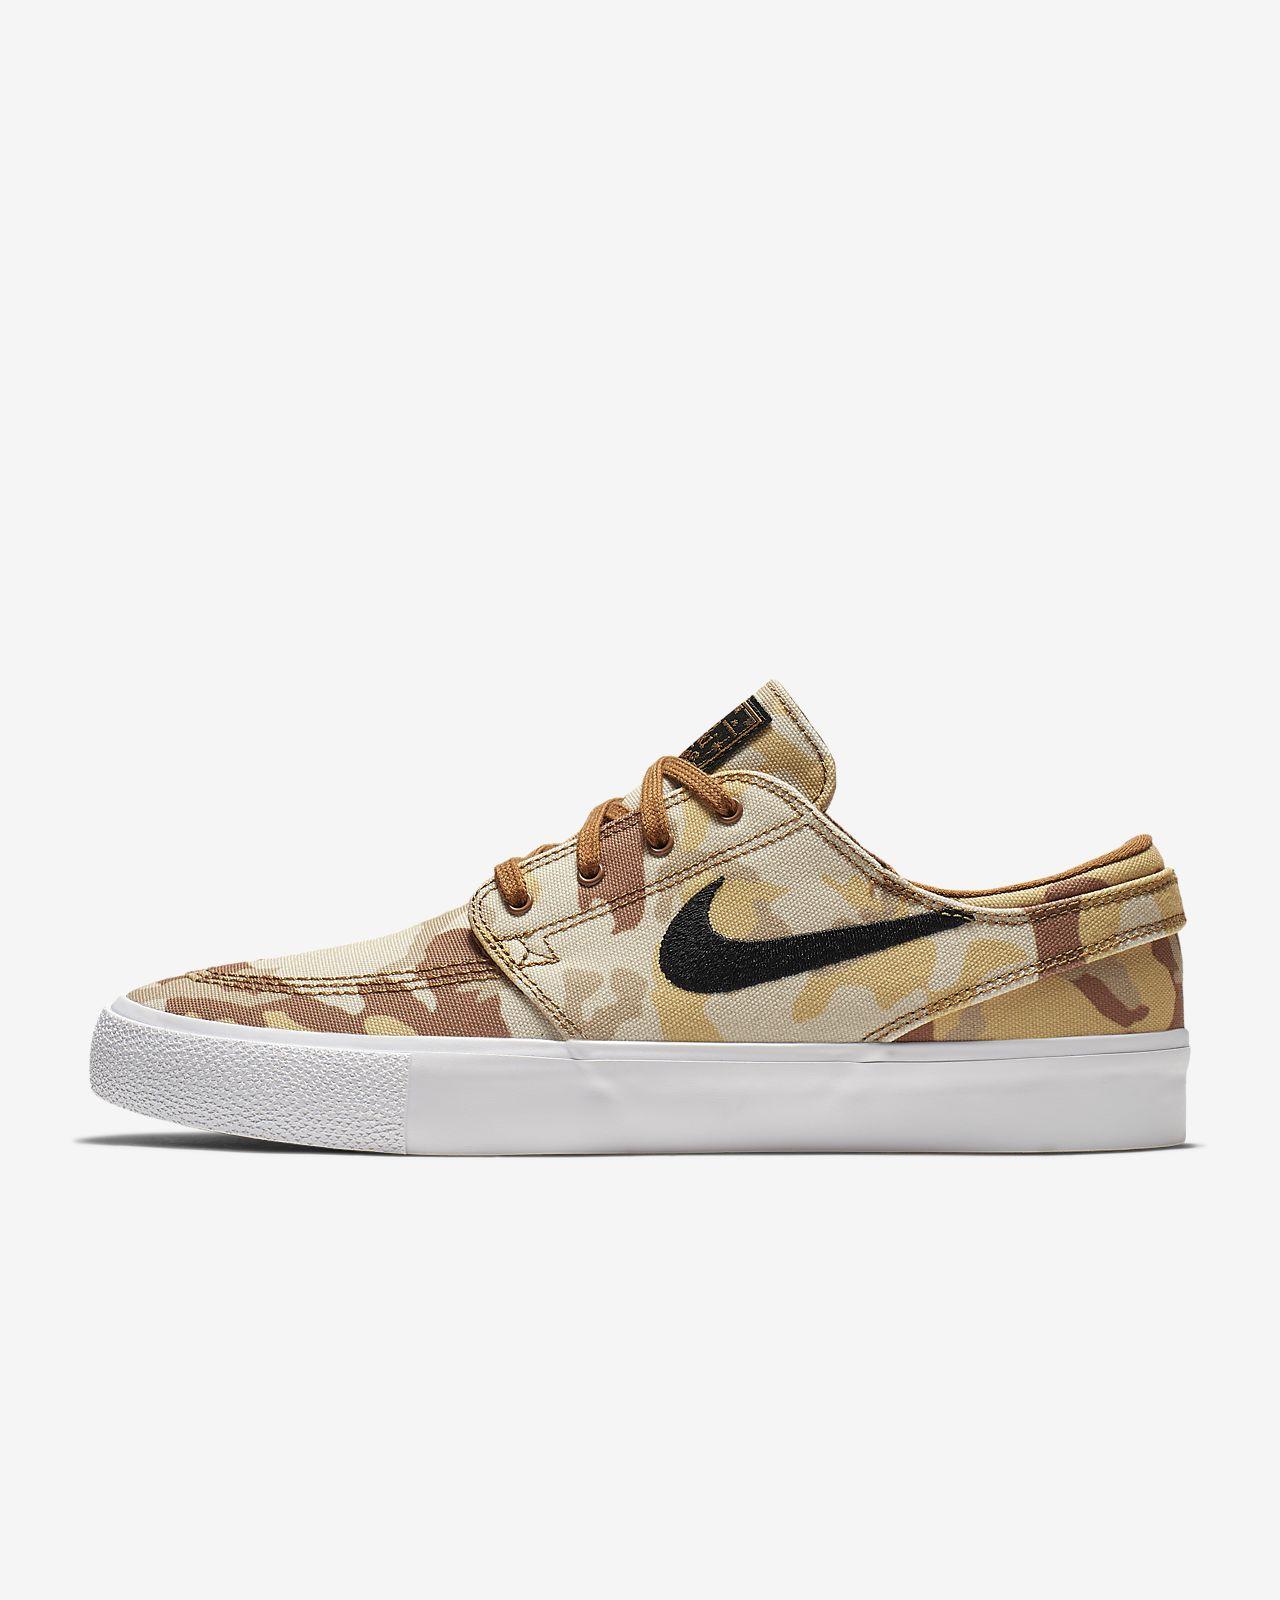 Nike SB Zoom Janoski Canvas Premium RM Kaykay Ayakkabısı